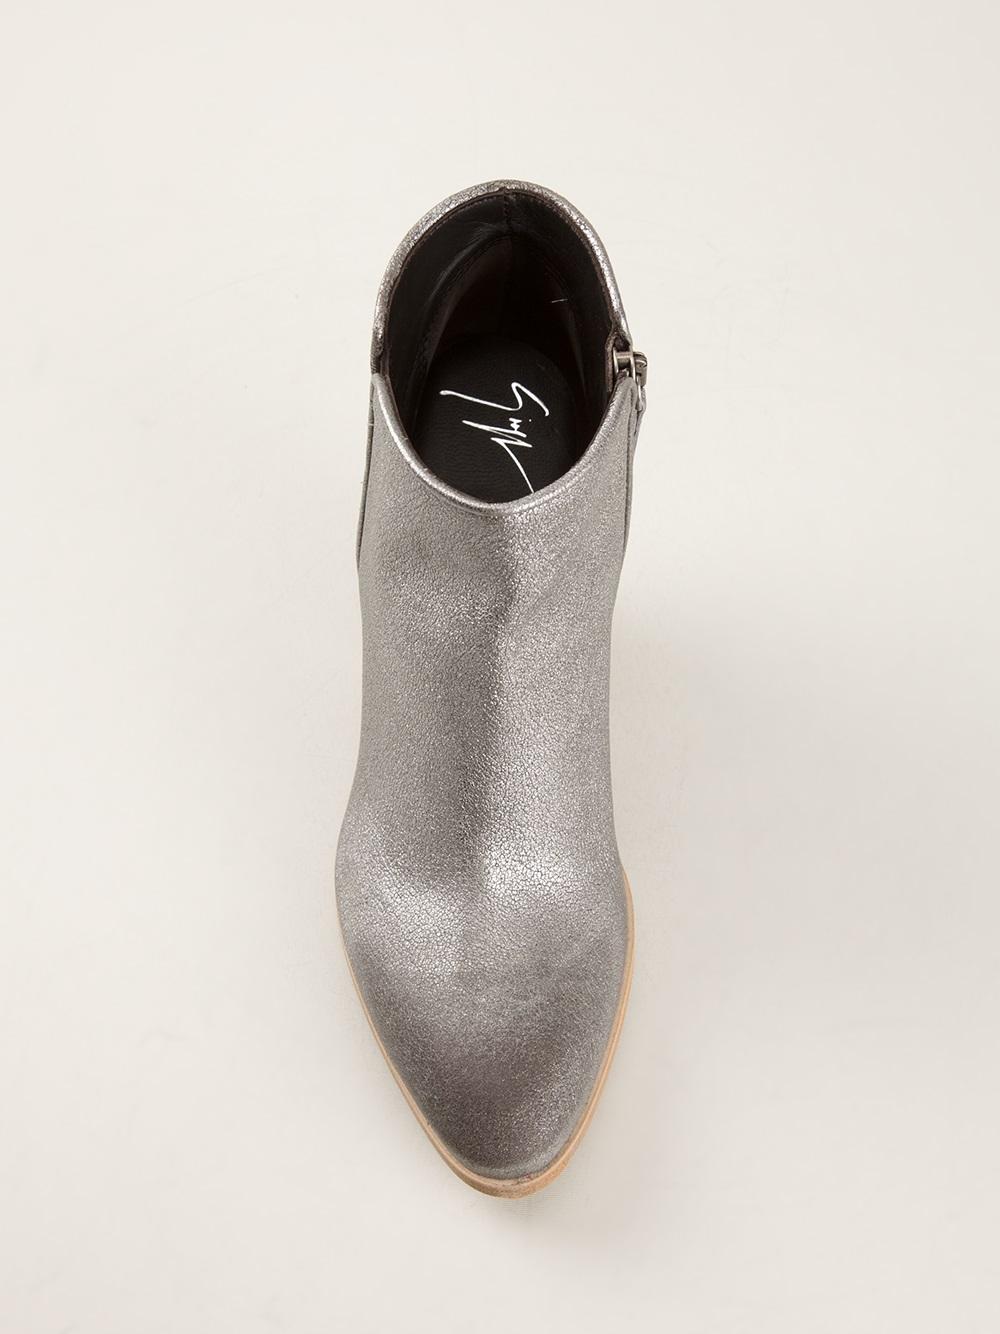 Giuseppe Zanotti Chunky Heel Ankle Boot in Metallic